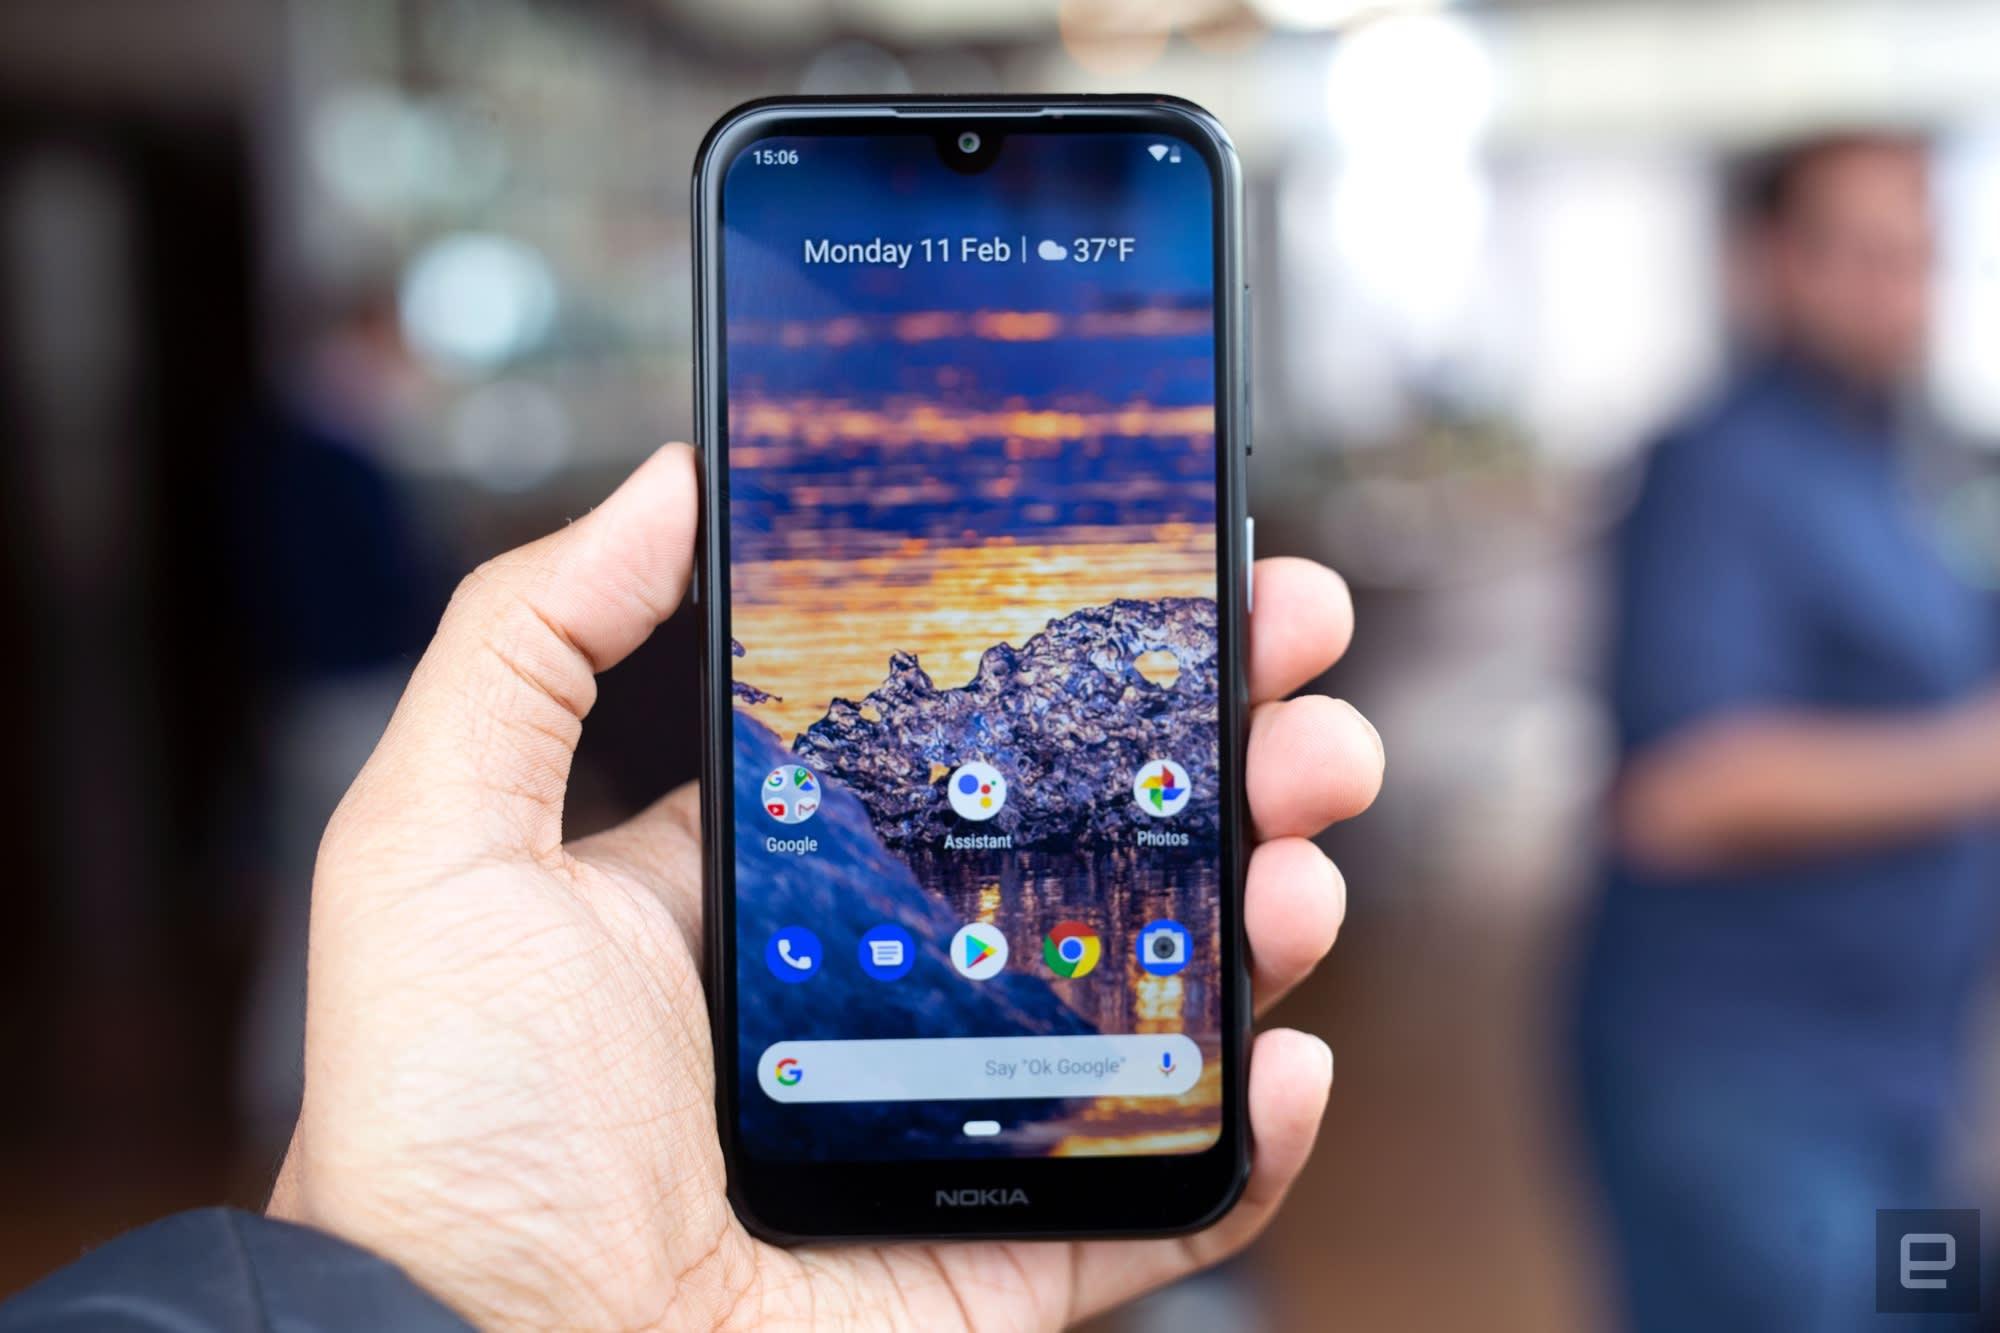 Nokia's MWC 2019 phones